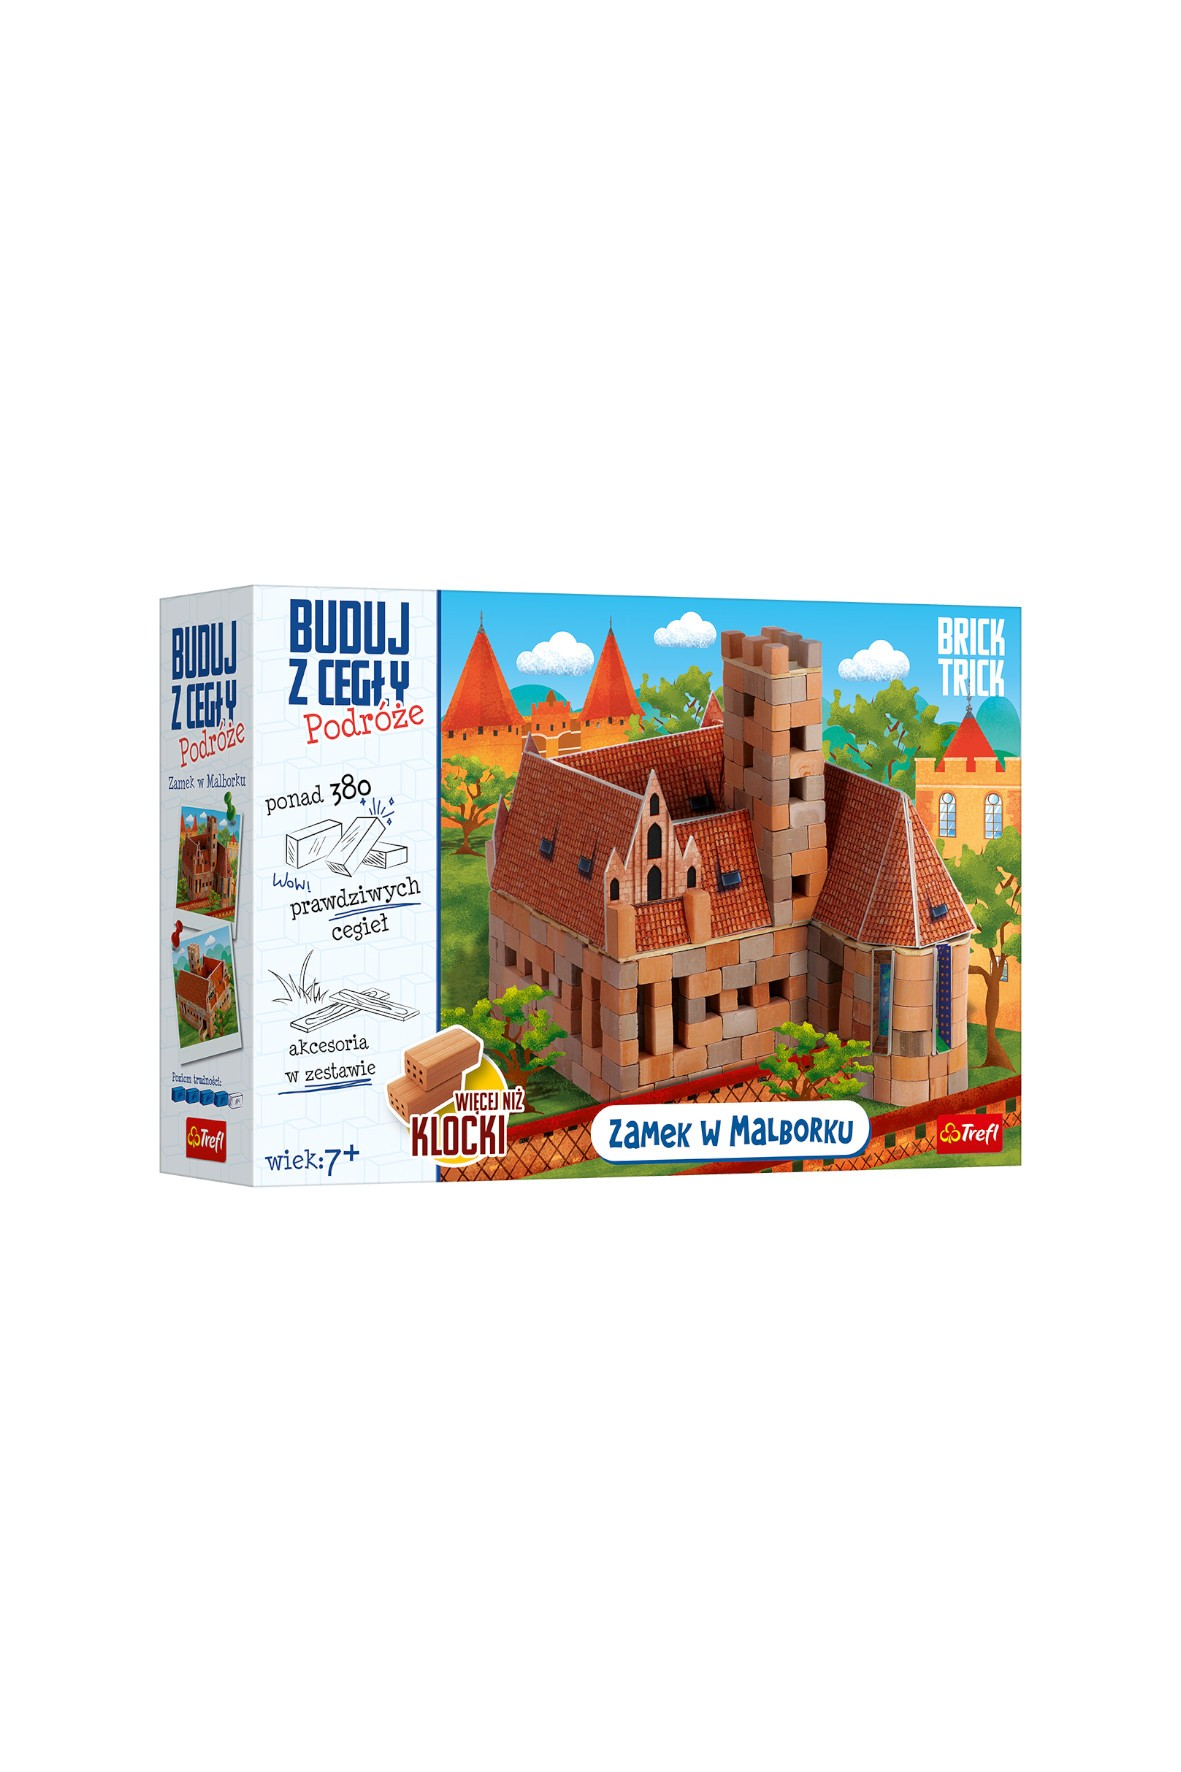 Brick Trick Podróże Zamek Malbork- klocki konstrukcyjne 7+